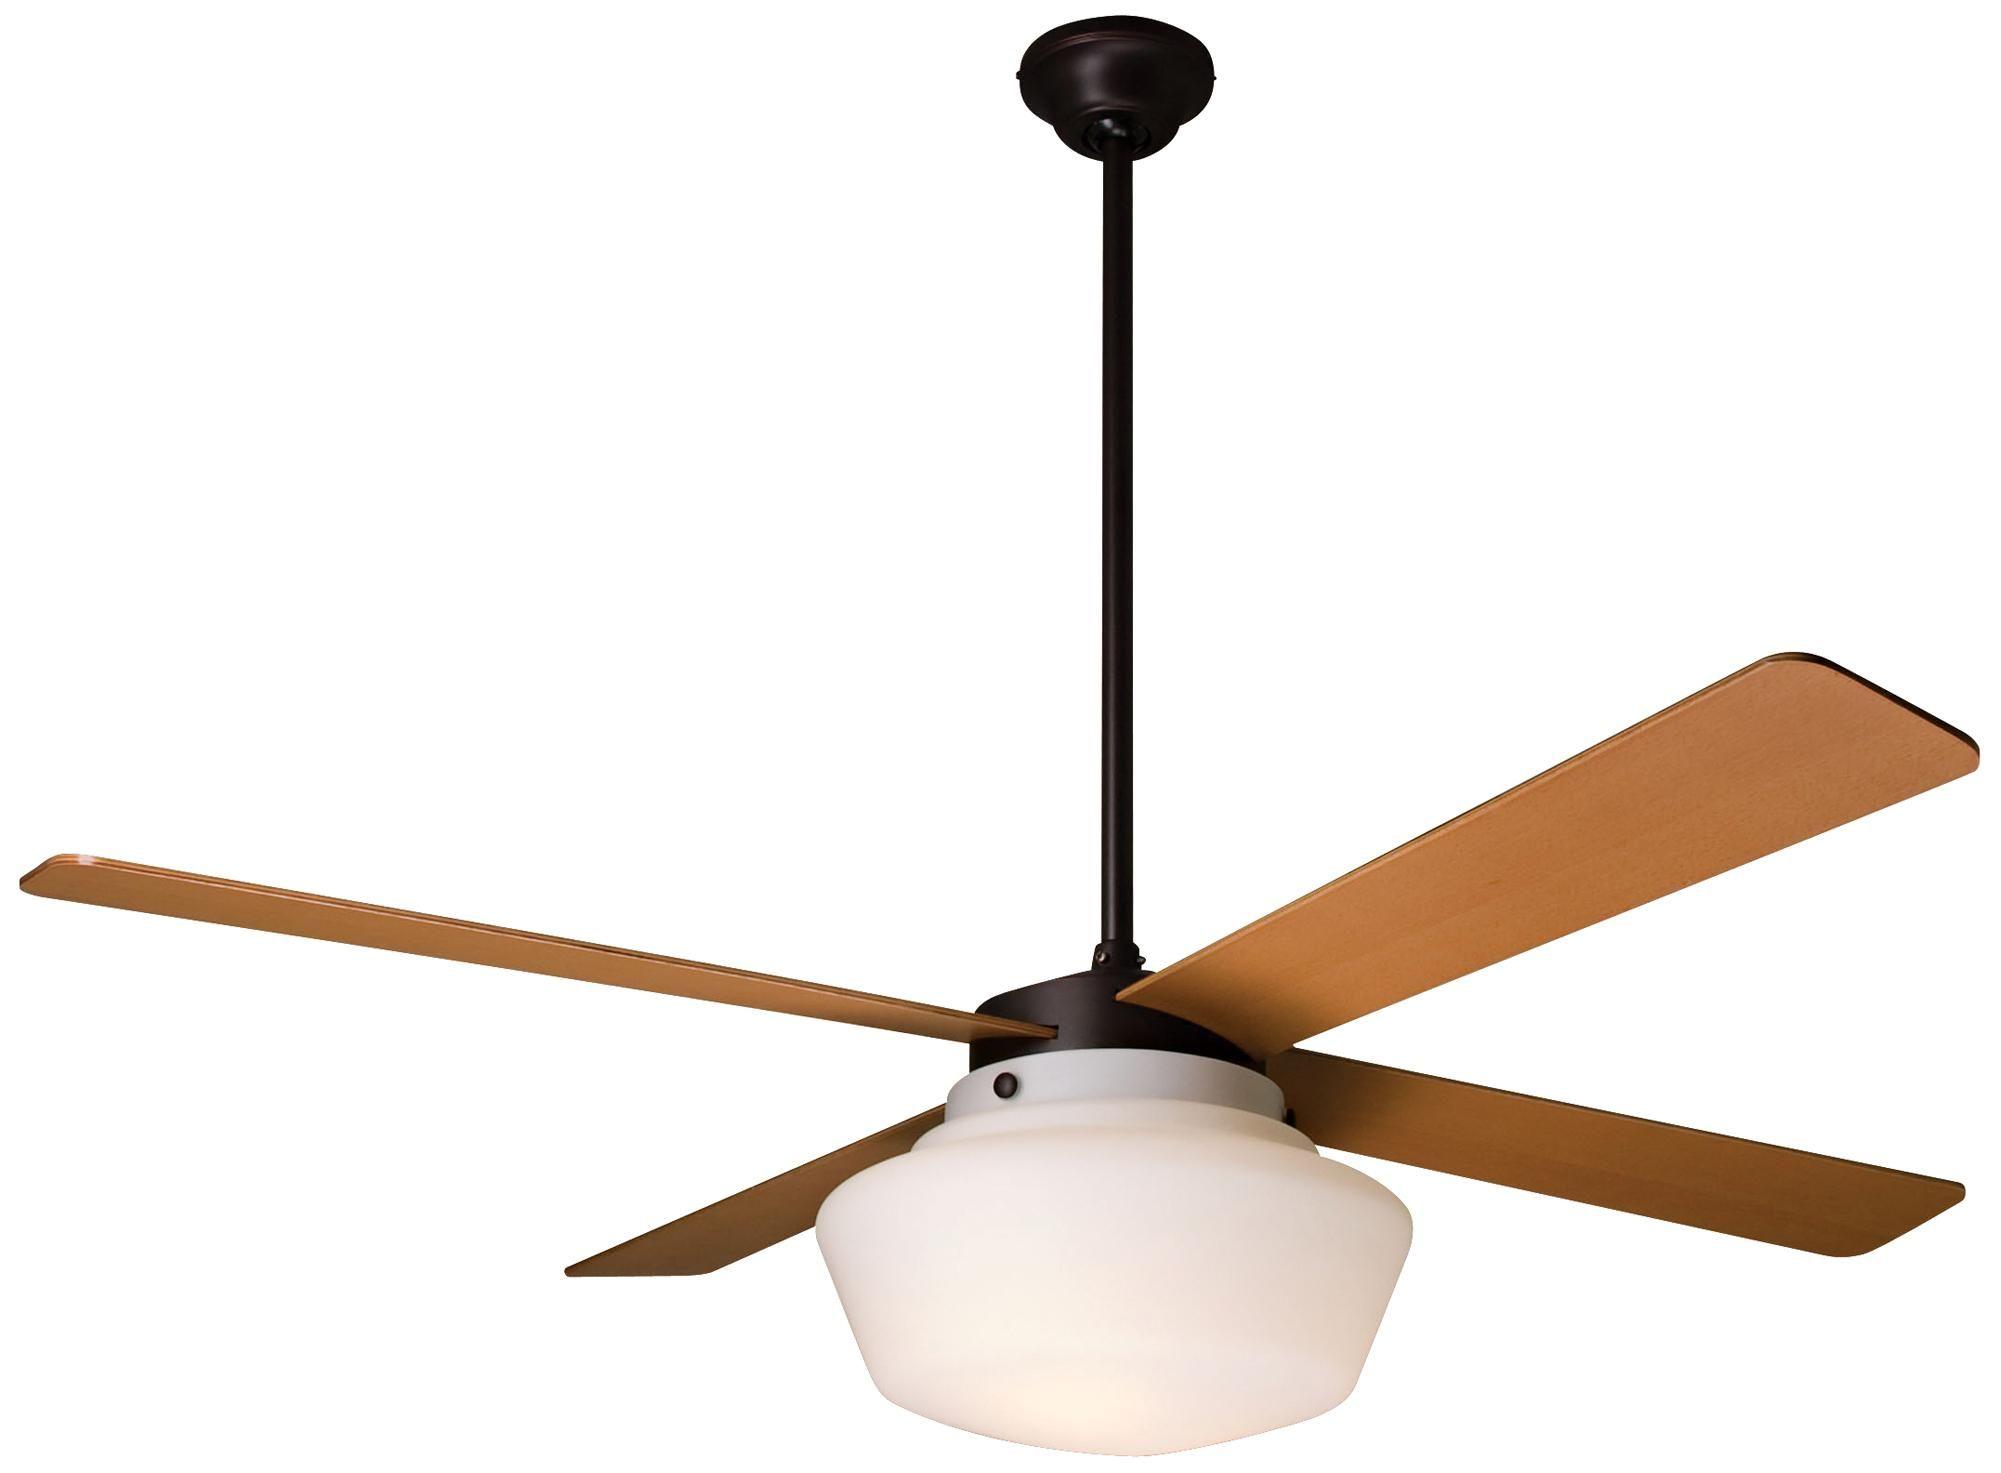 52 period arts schoolhouse ceiling fan briggs house lighting rh pinterest fr